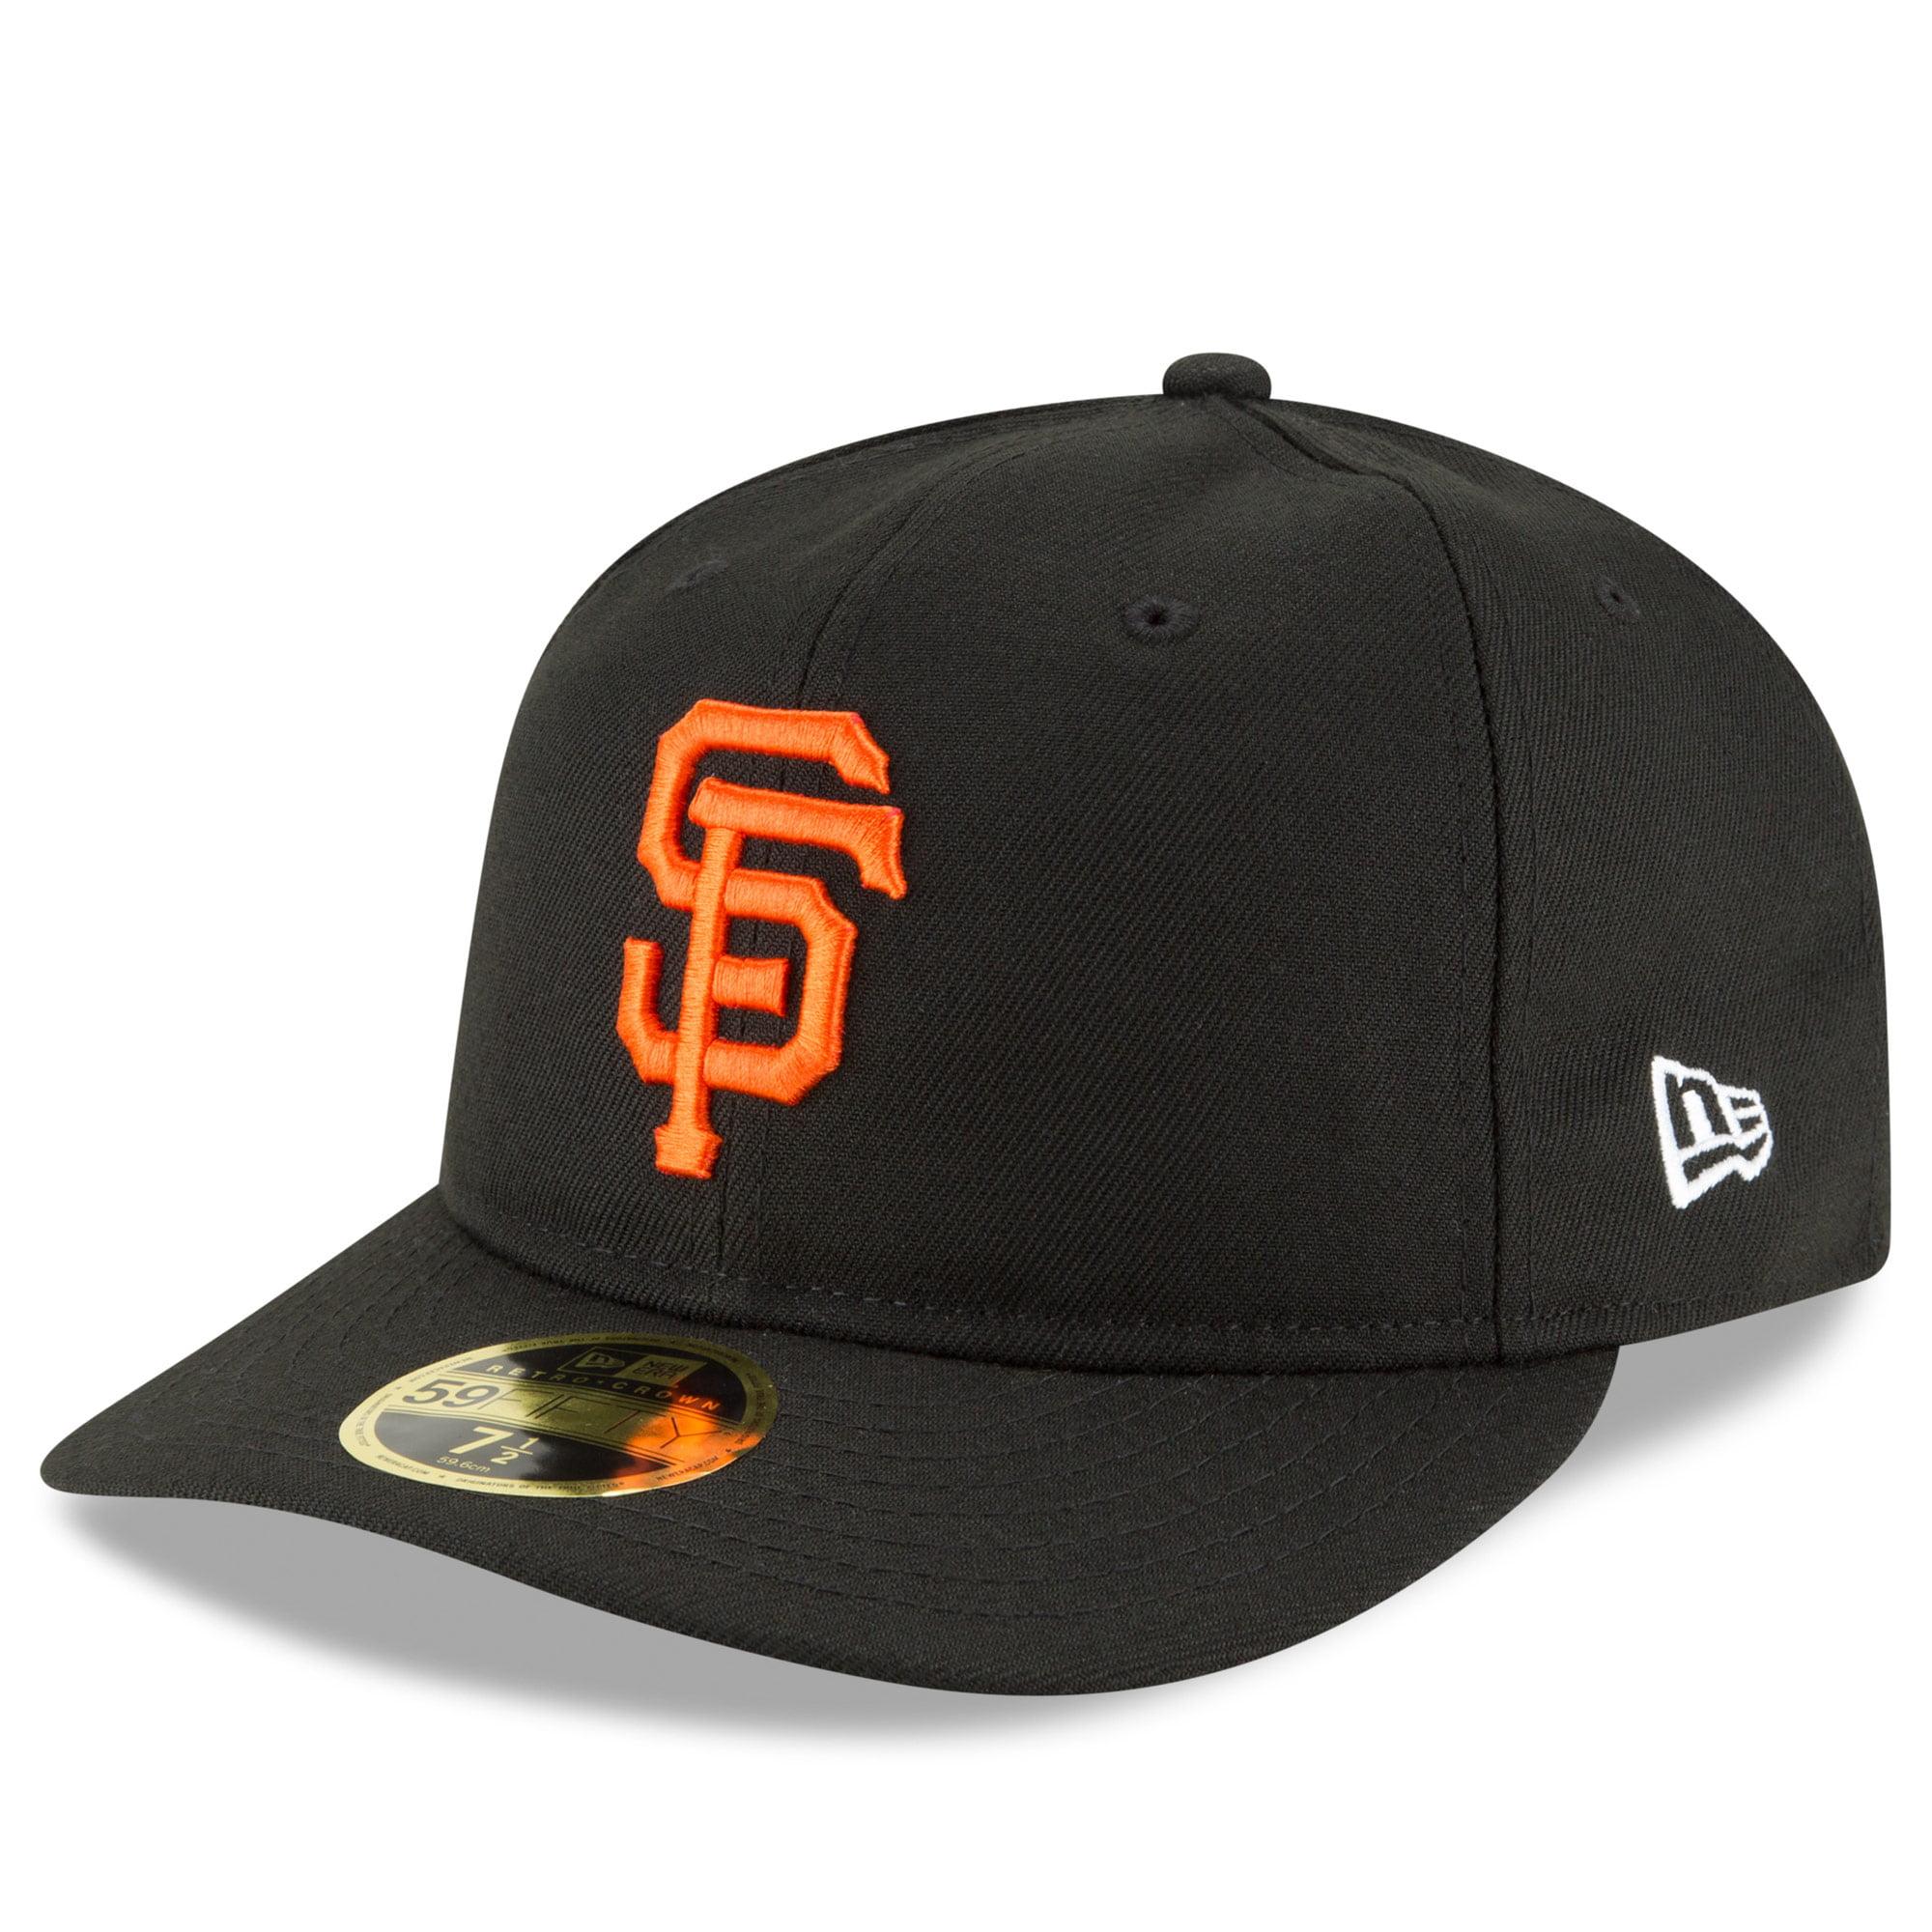 San Francisco Giants New Era Fan Retro Low Profile 59FIFTY Fitted Hat - Black